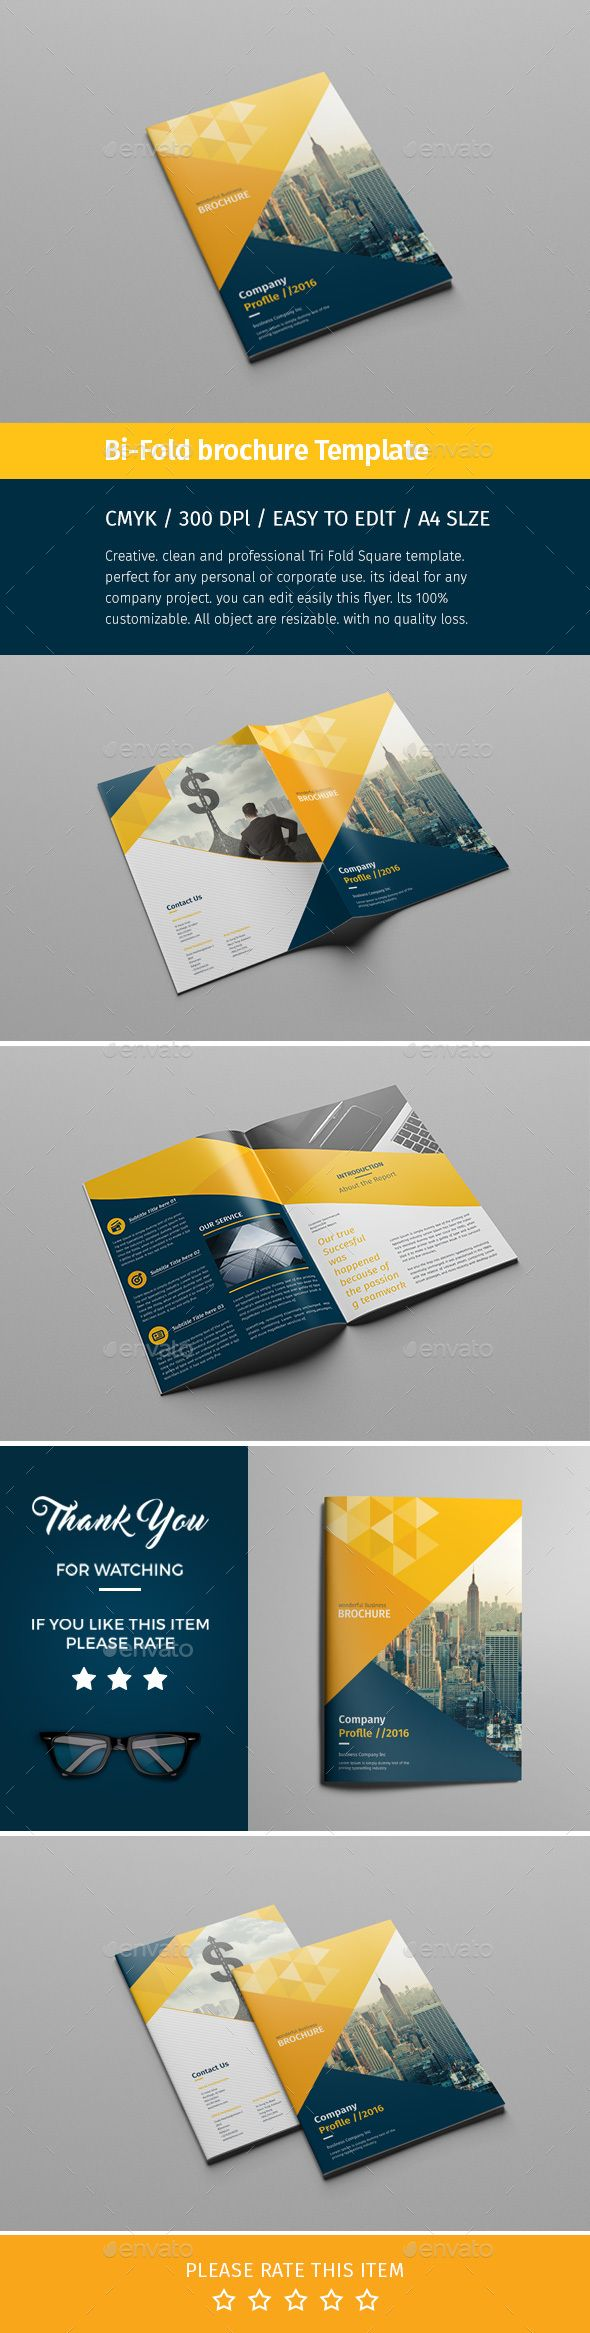 Corporate Bi-fold Brochure Template PSD. Download here…